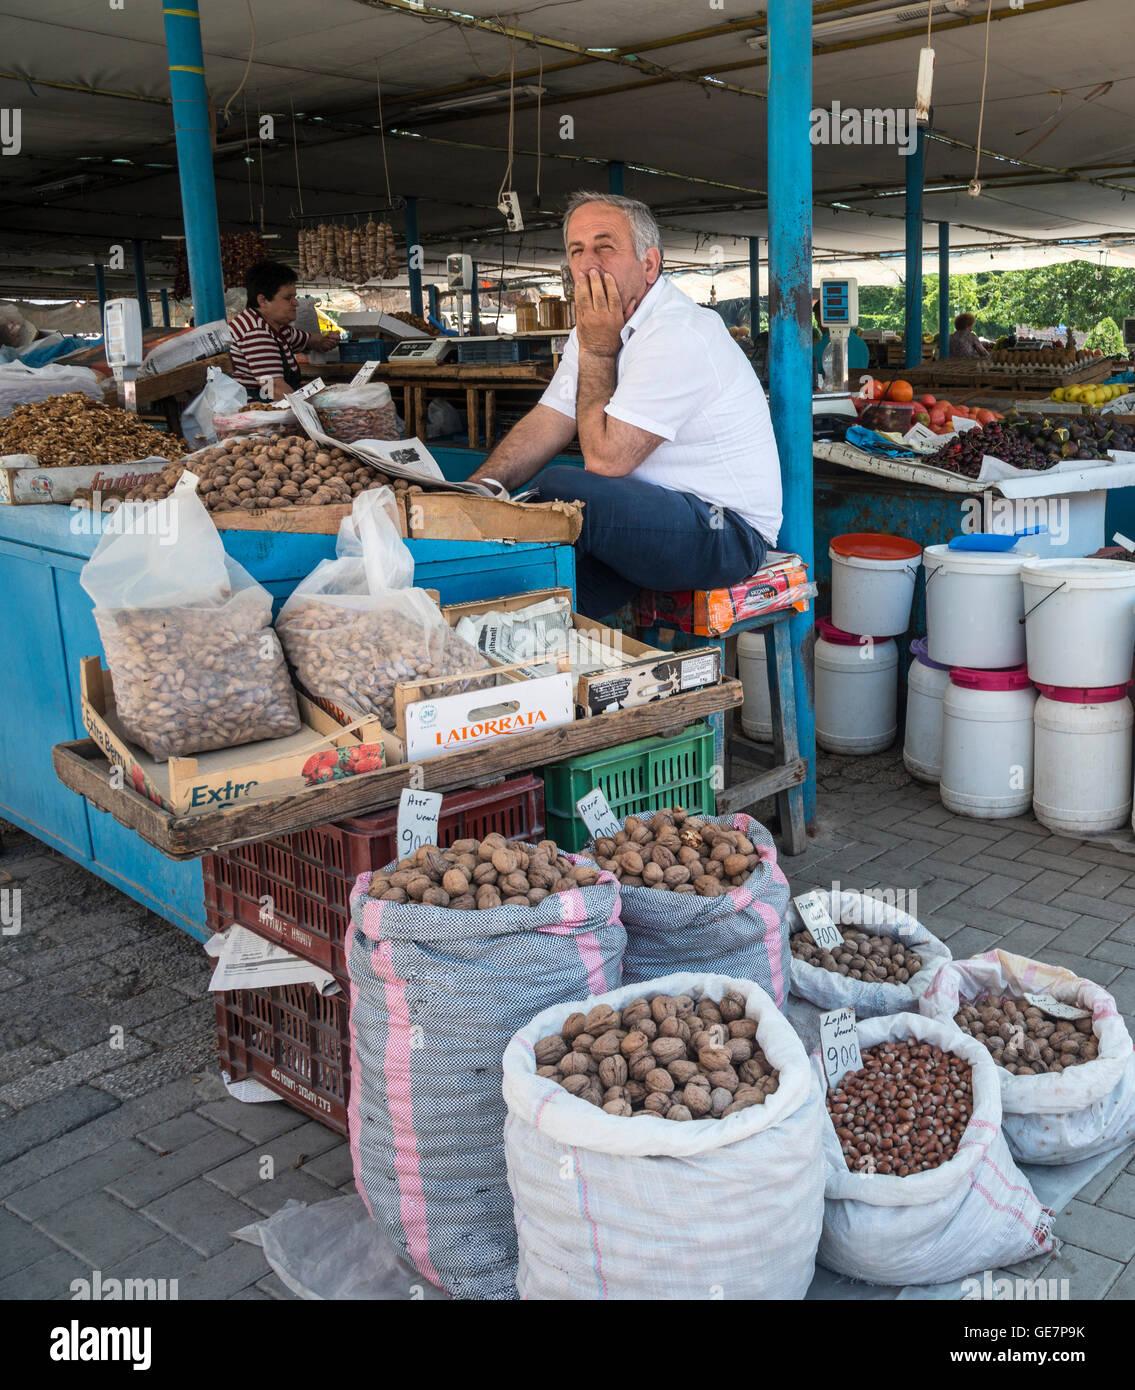 Stall selling nuts in the Pazari i Ri, central market, in Tirana, Albania, - Stock Image